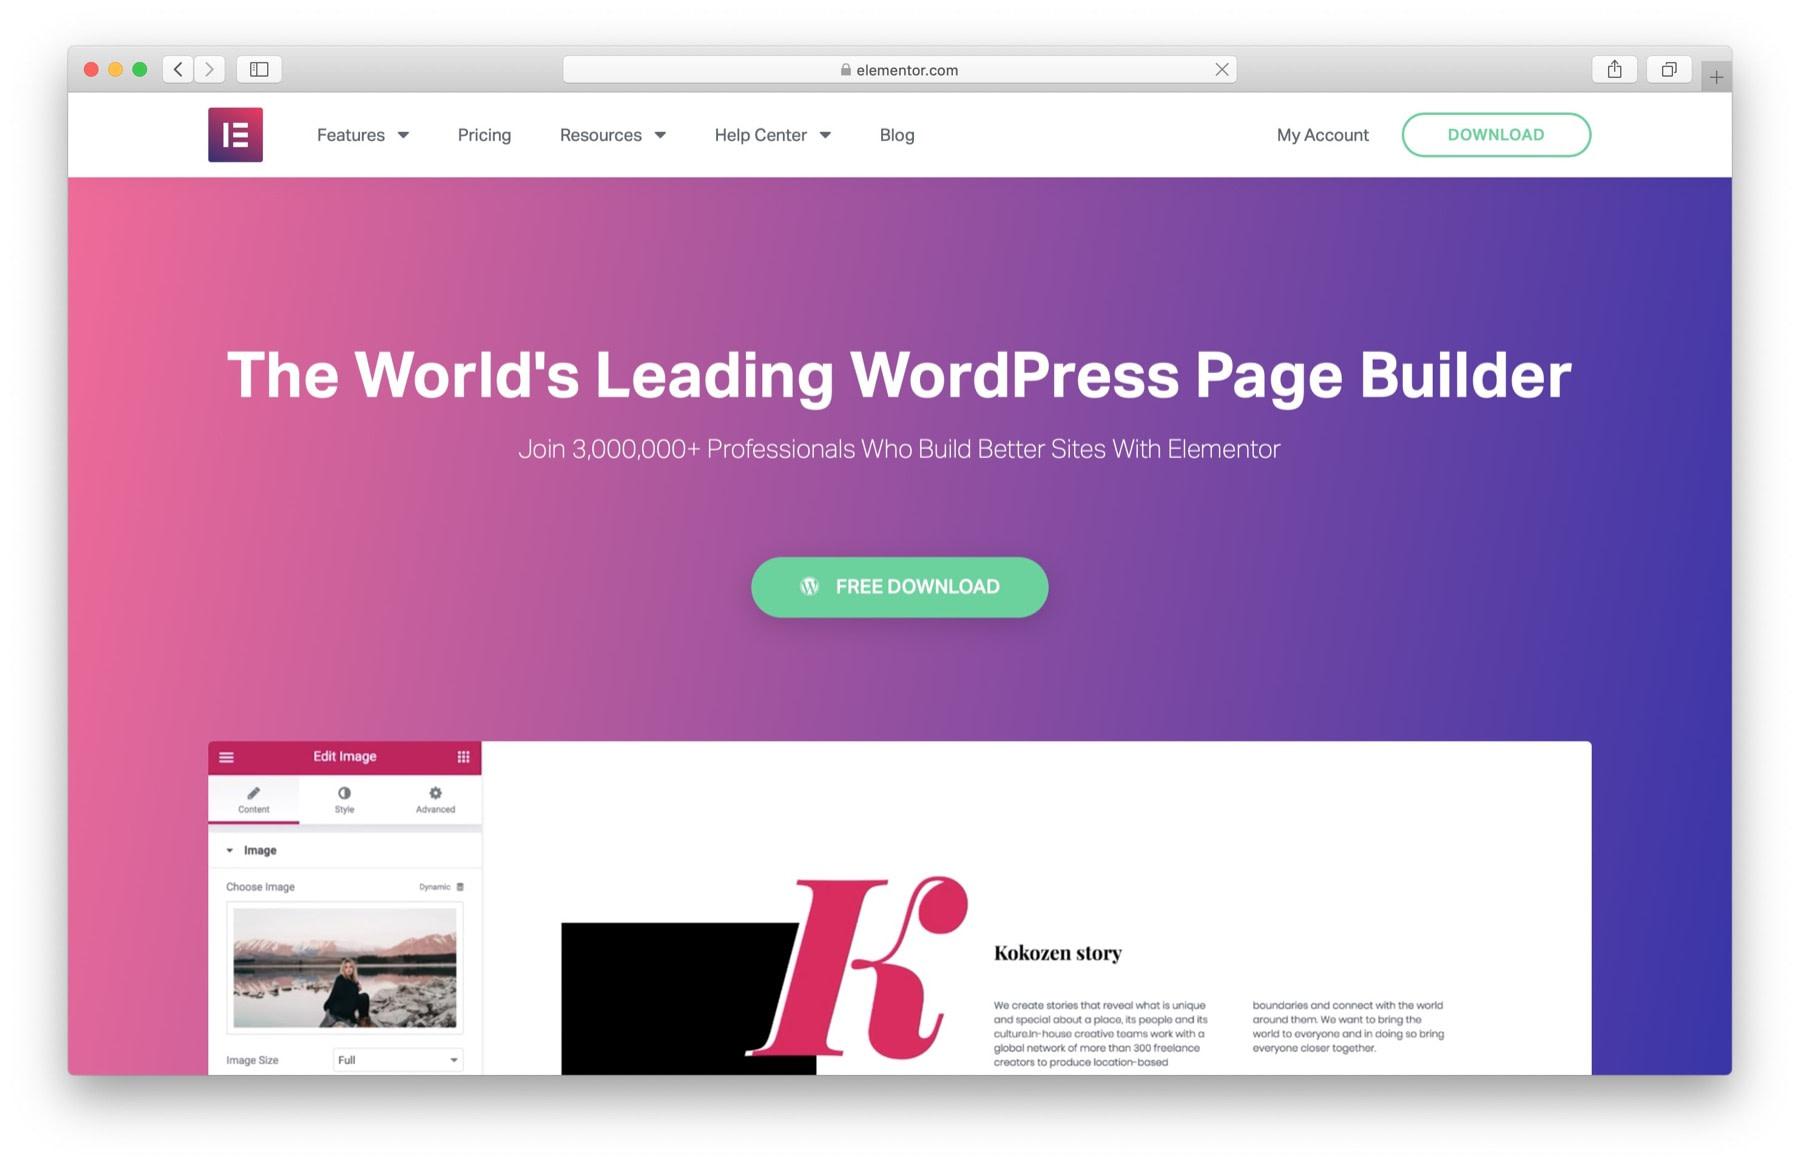 WordPress Black Friday 2019: Elementor